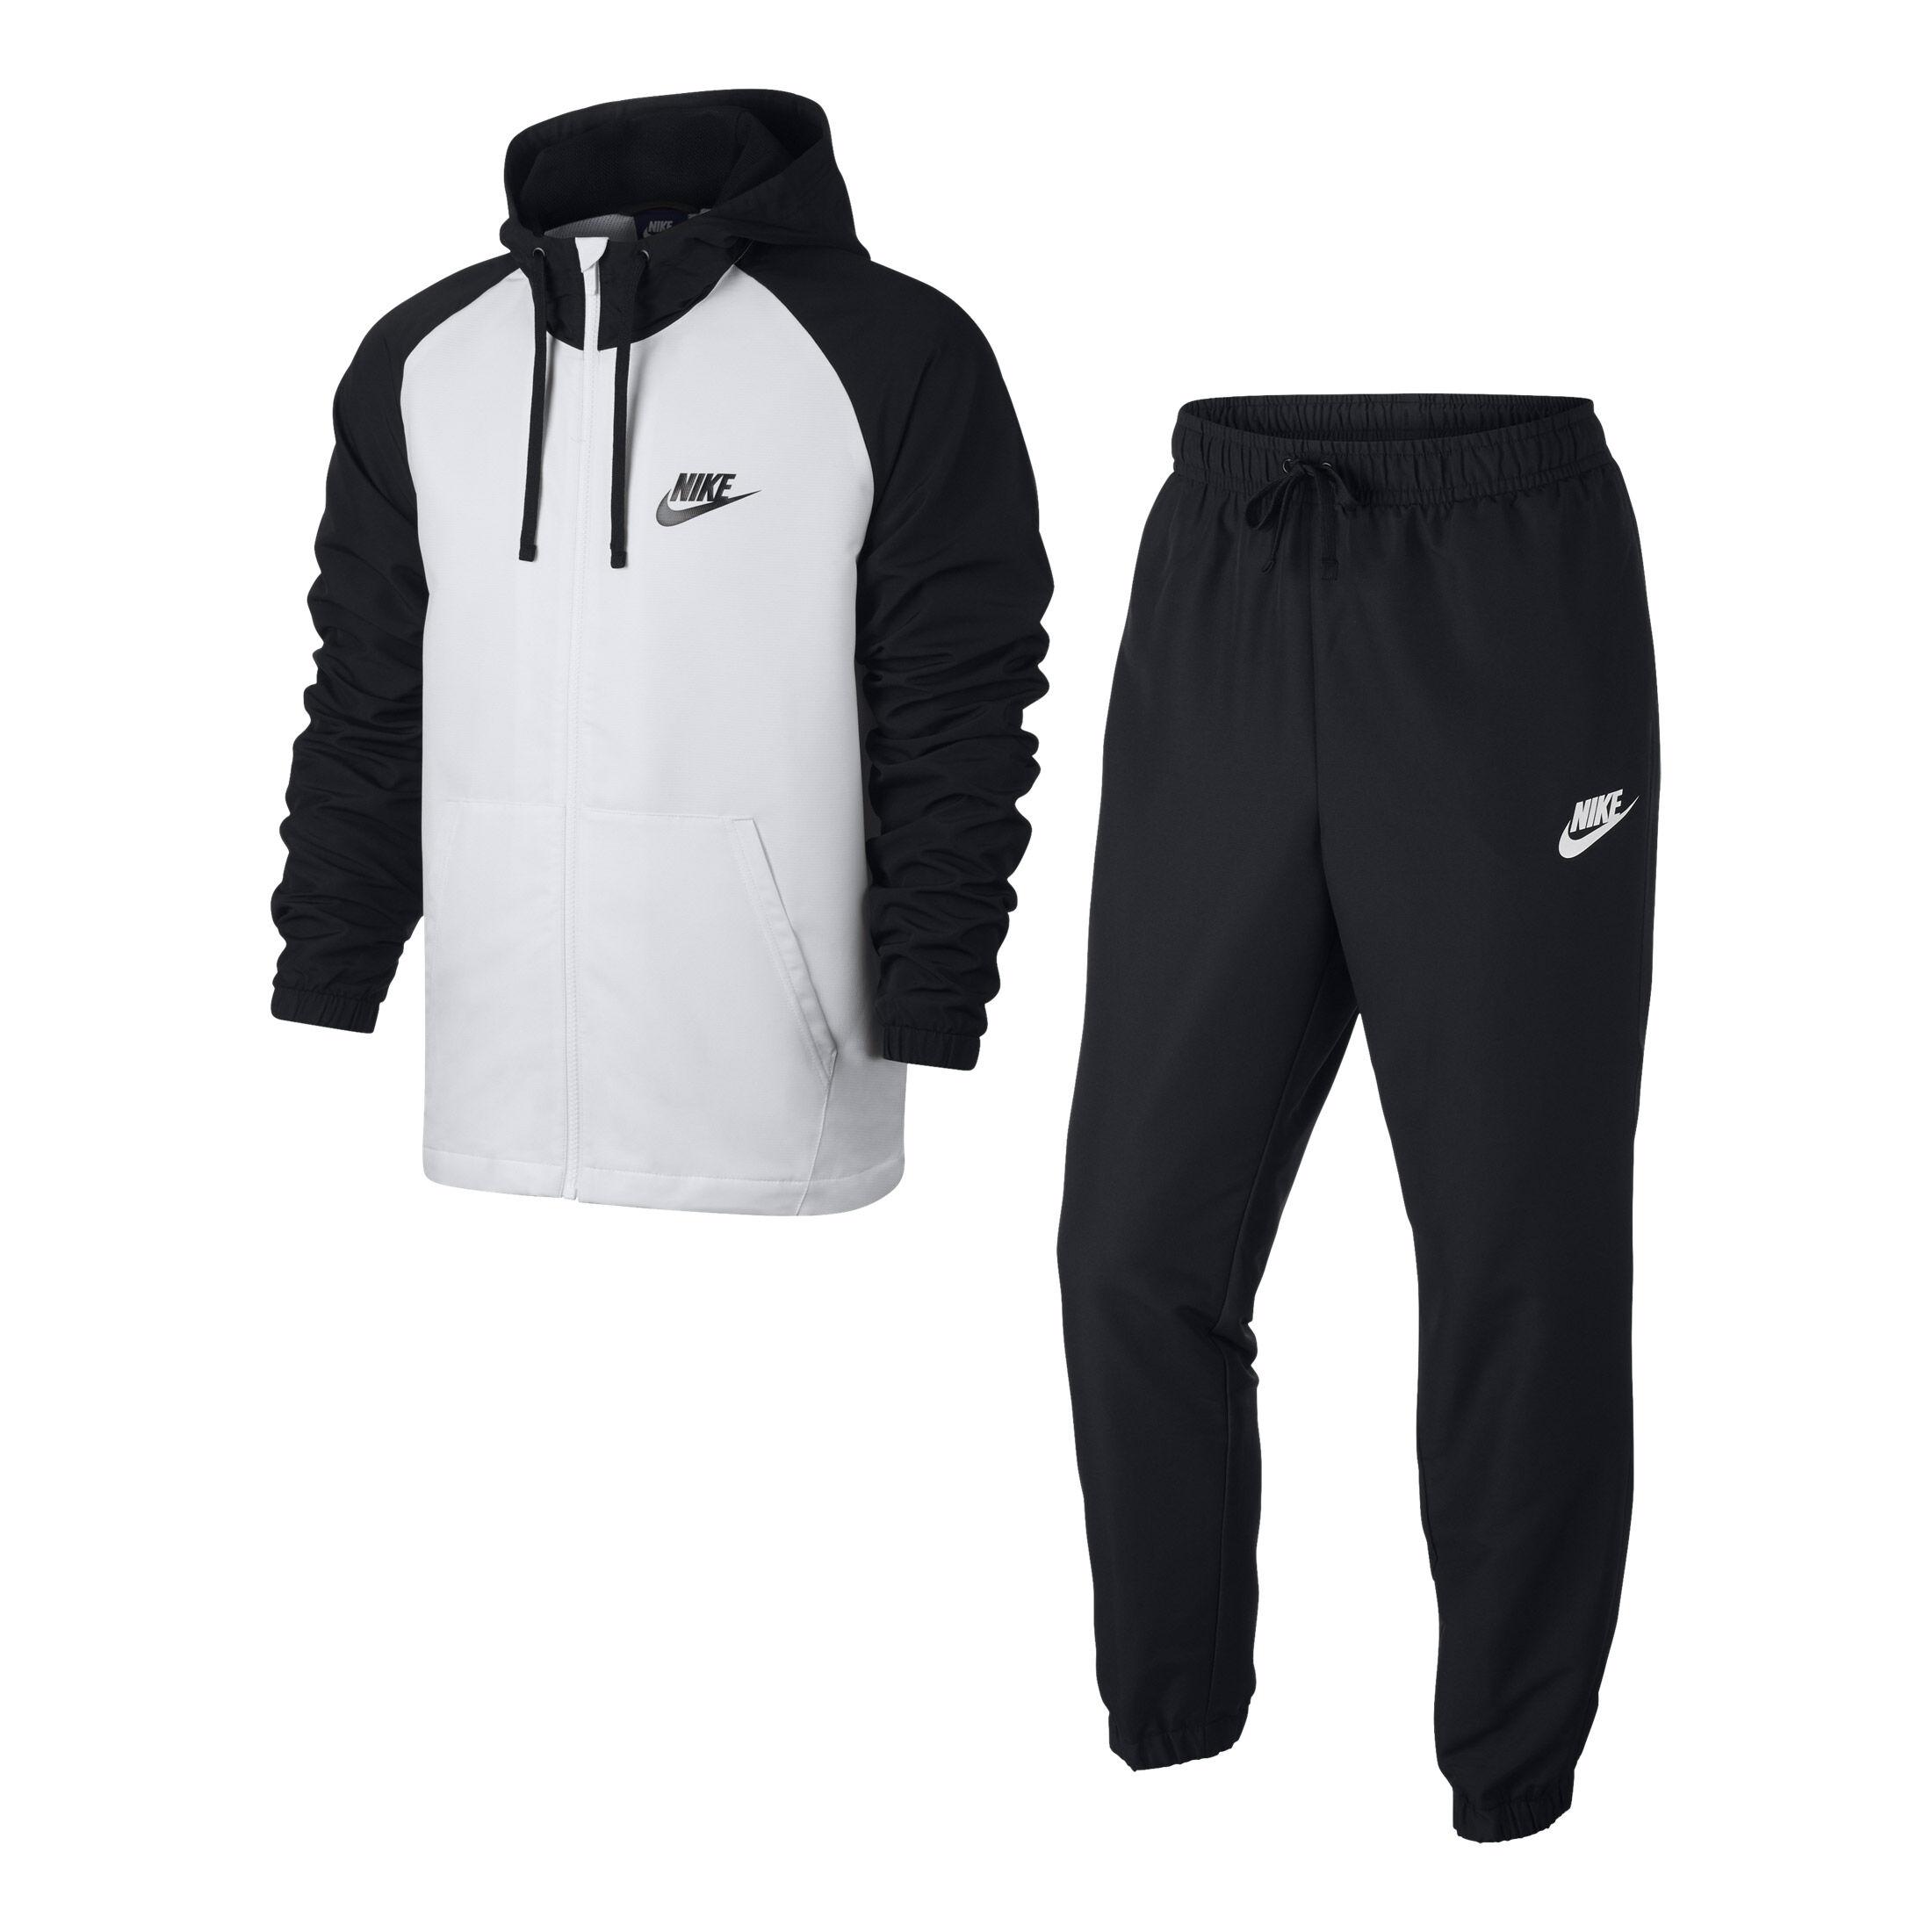 Nike Chándal Hombres - Negro, Blanco compra online | Tennis ...